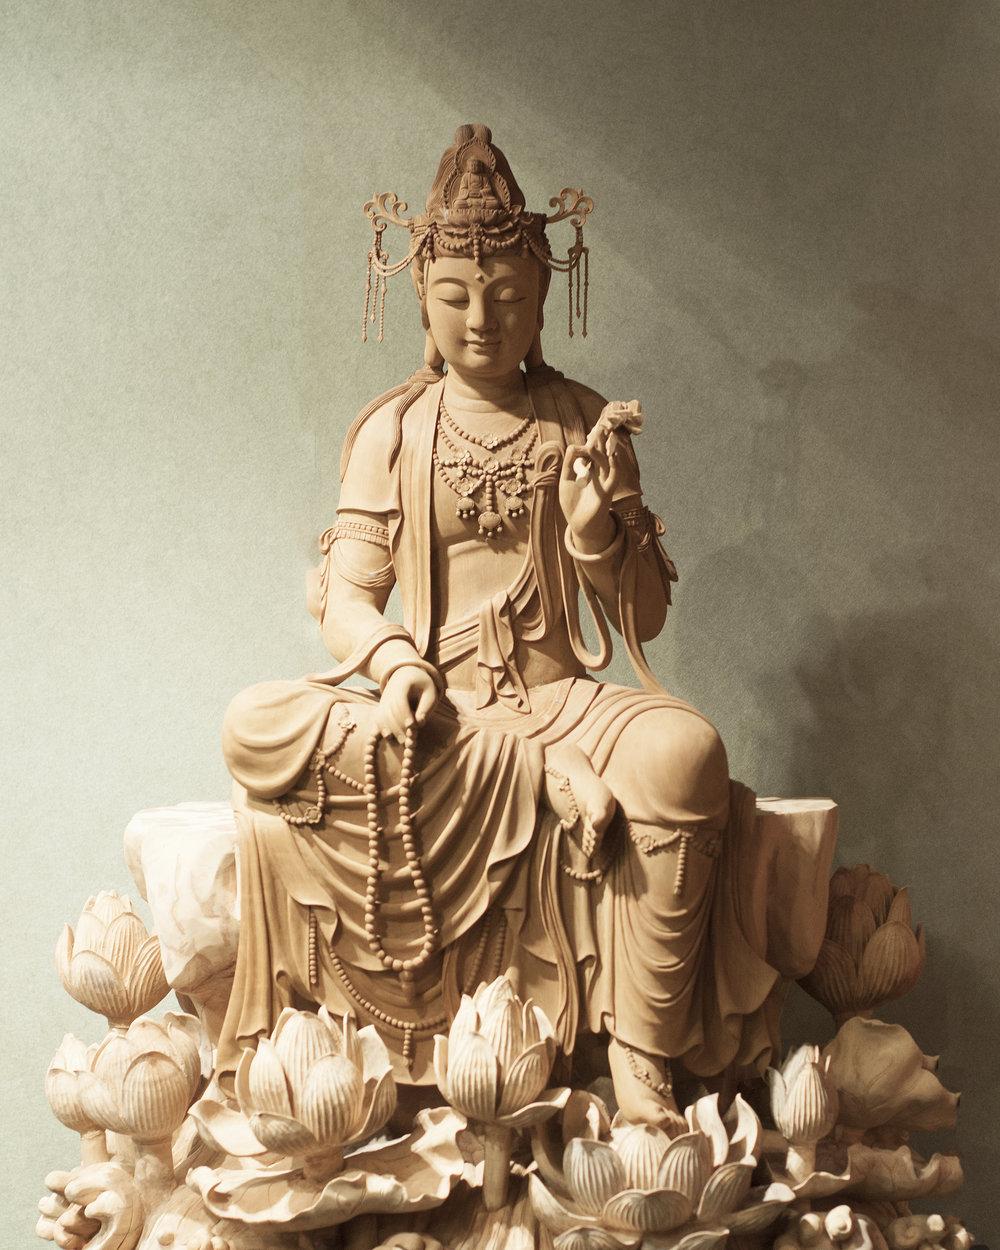 Bodhisattva1_small.jpg